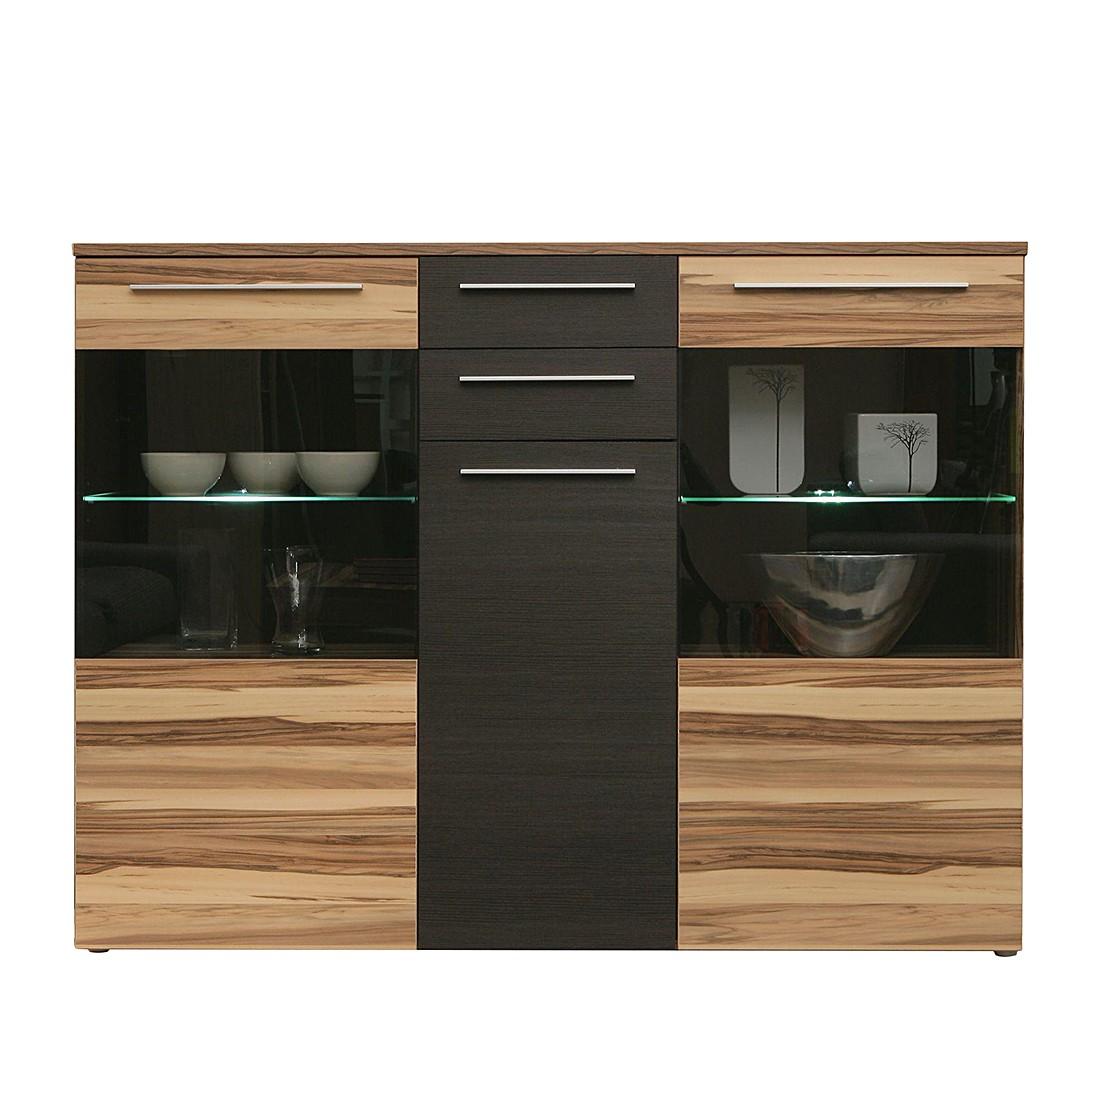 mooved archive seite 8 von 9. Black Bedroom Furniture Sets. Home Design Ideas